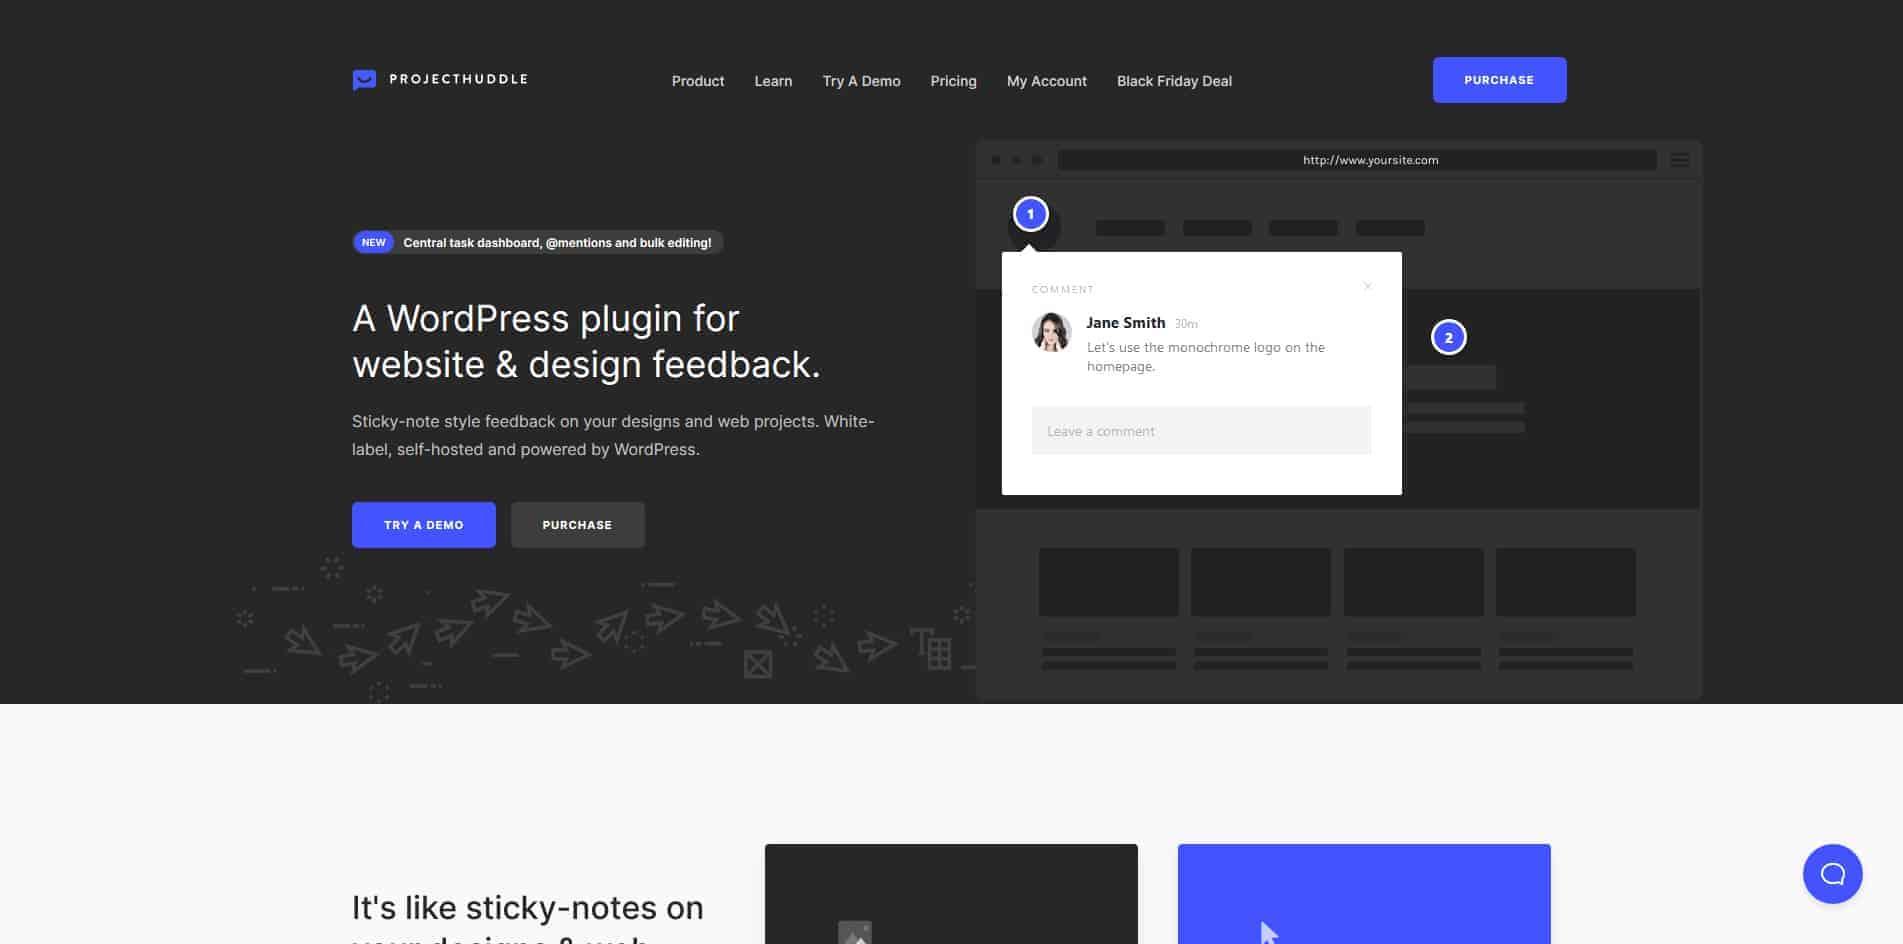 project huddle homepage screenshot